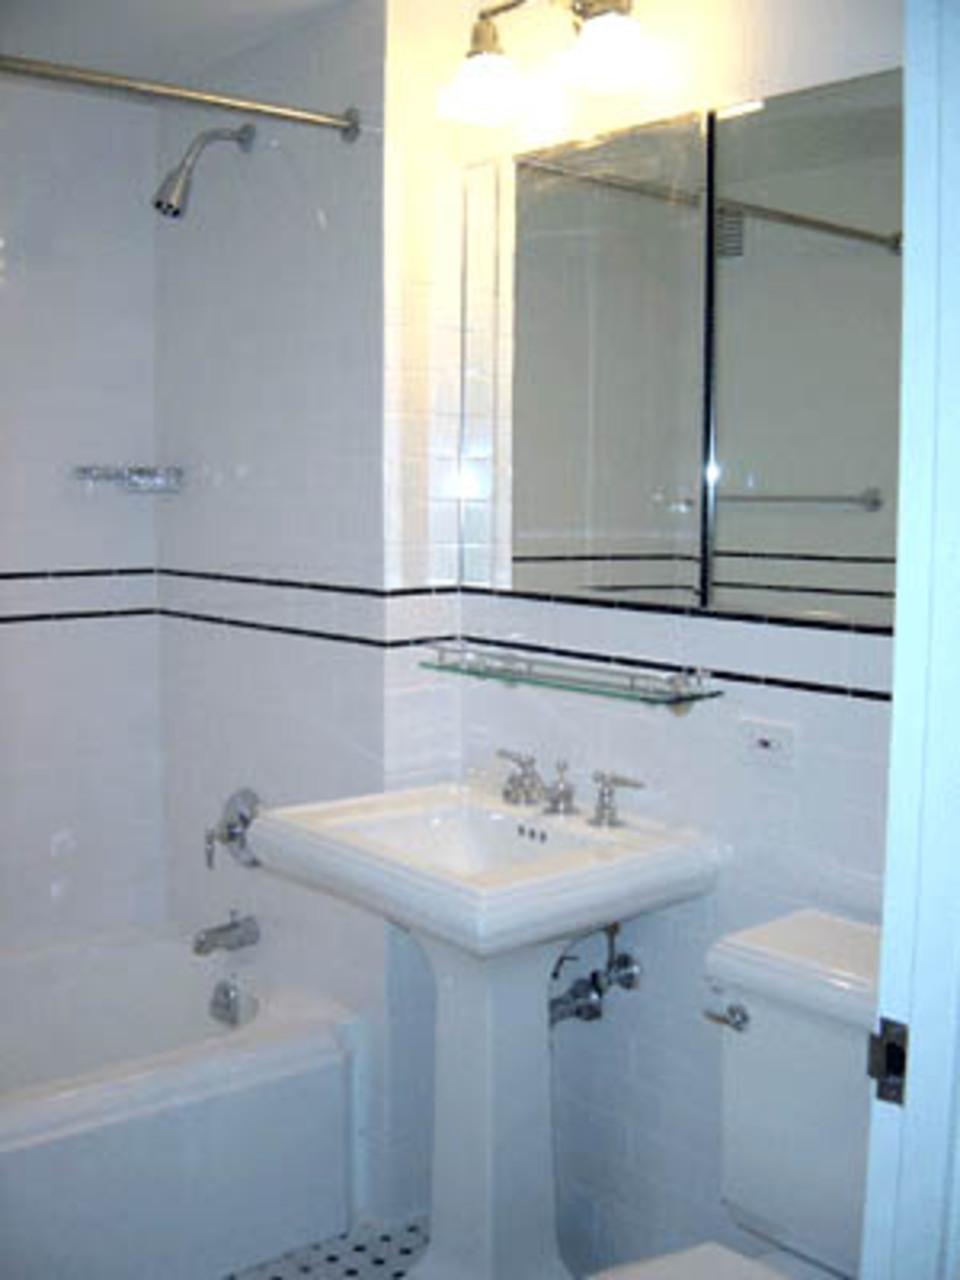 Ivy Tower rental building Bathroom - NYC Flats